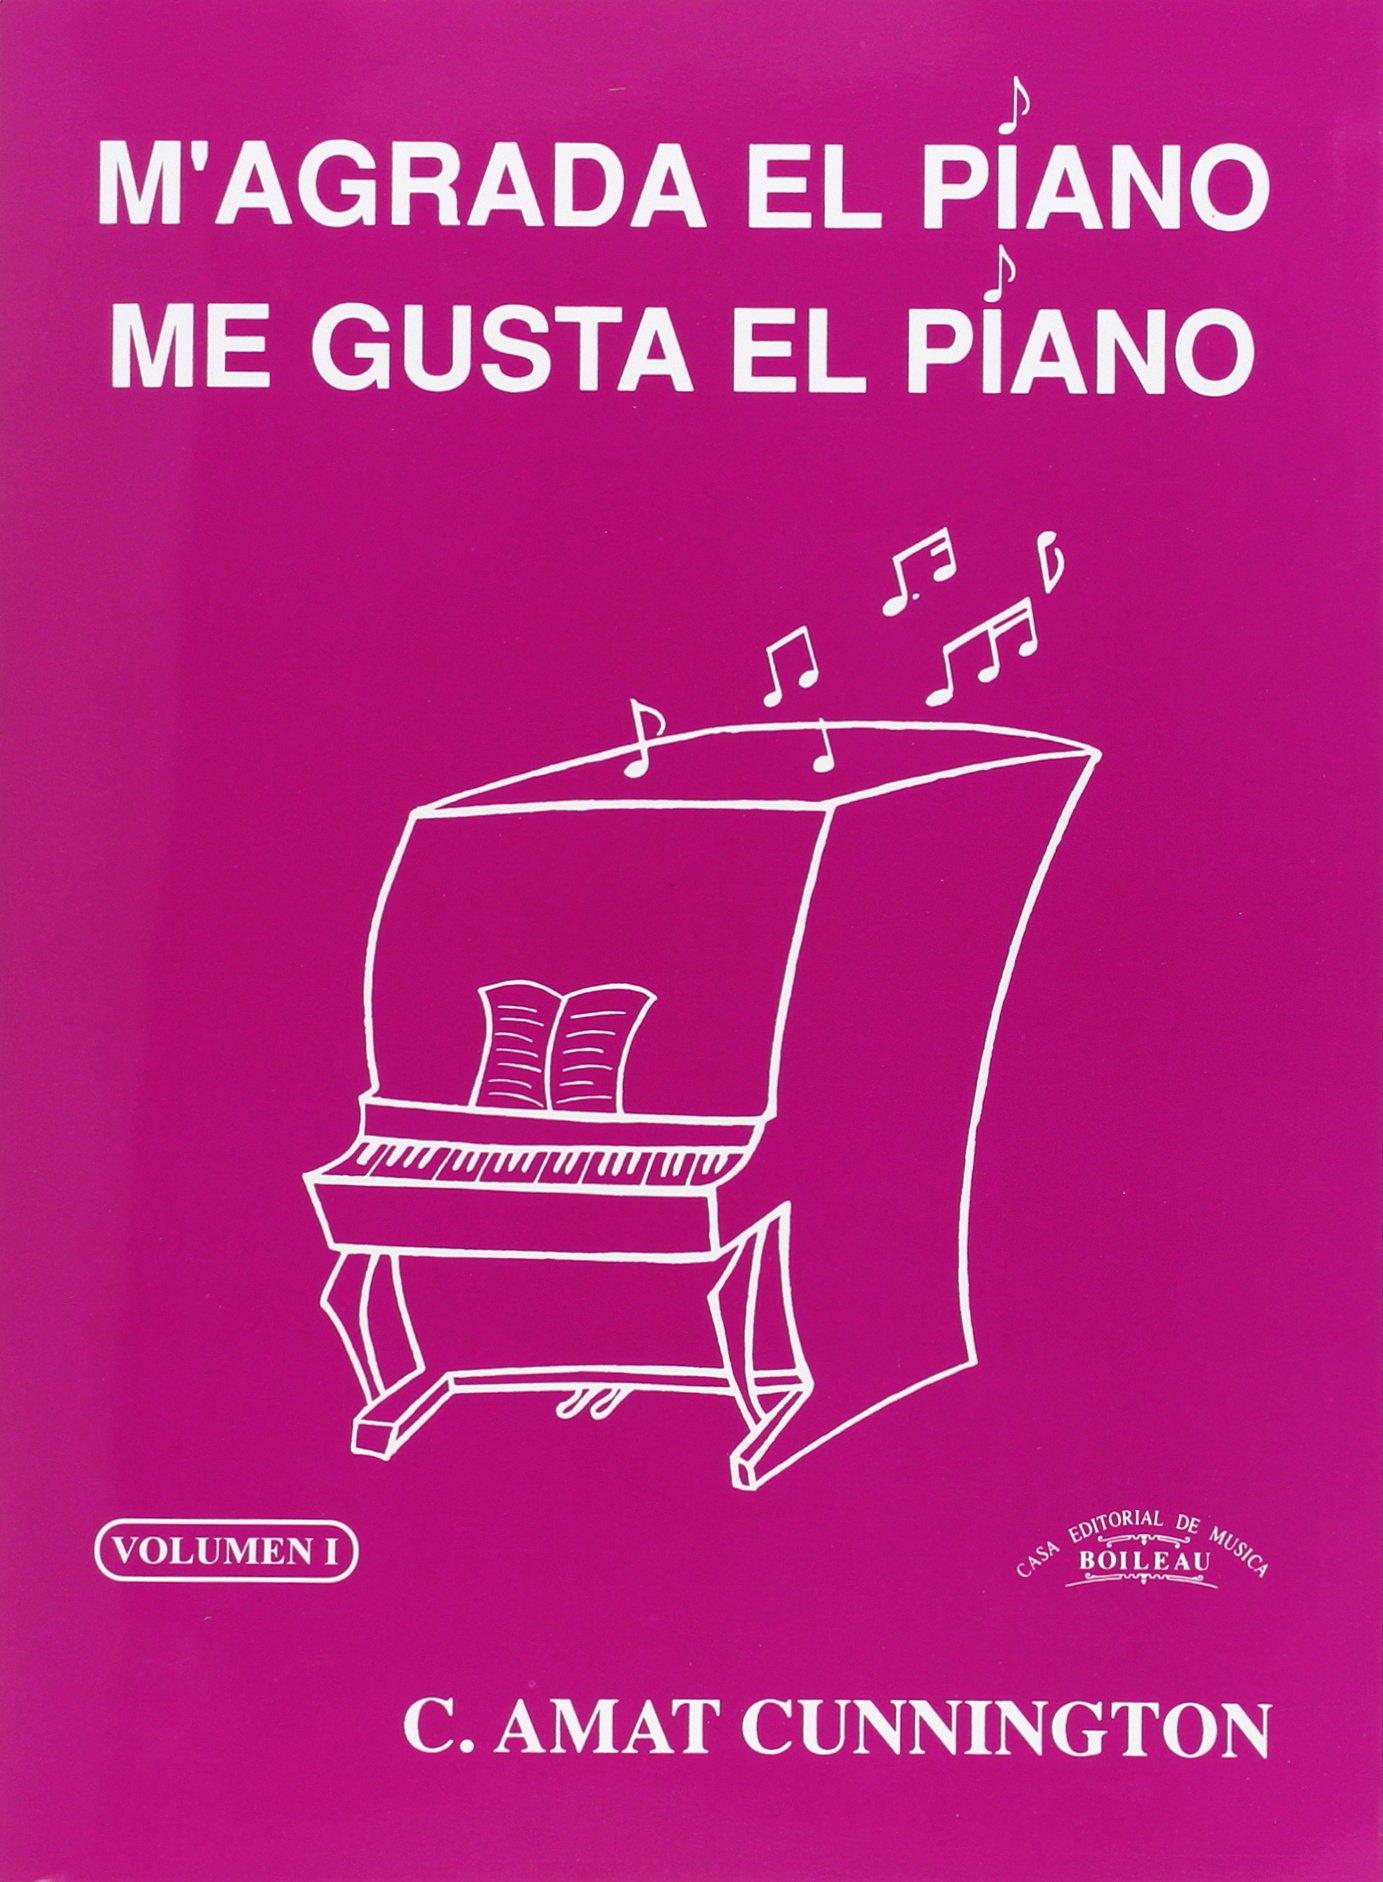 1.M AGRADA EN PIANO/ME GUSTA EL PIANO.(PIANO).(REF:B.2770): AMAT CUNINGTON C.: 9788480206389: Amazon.com: Books